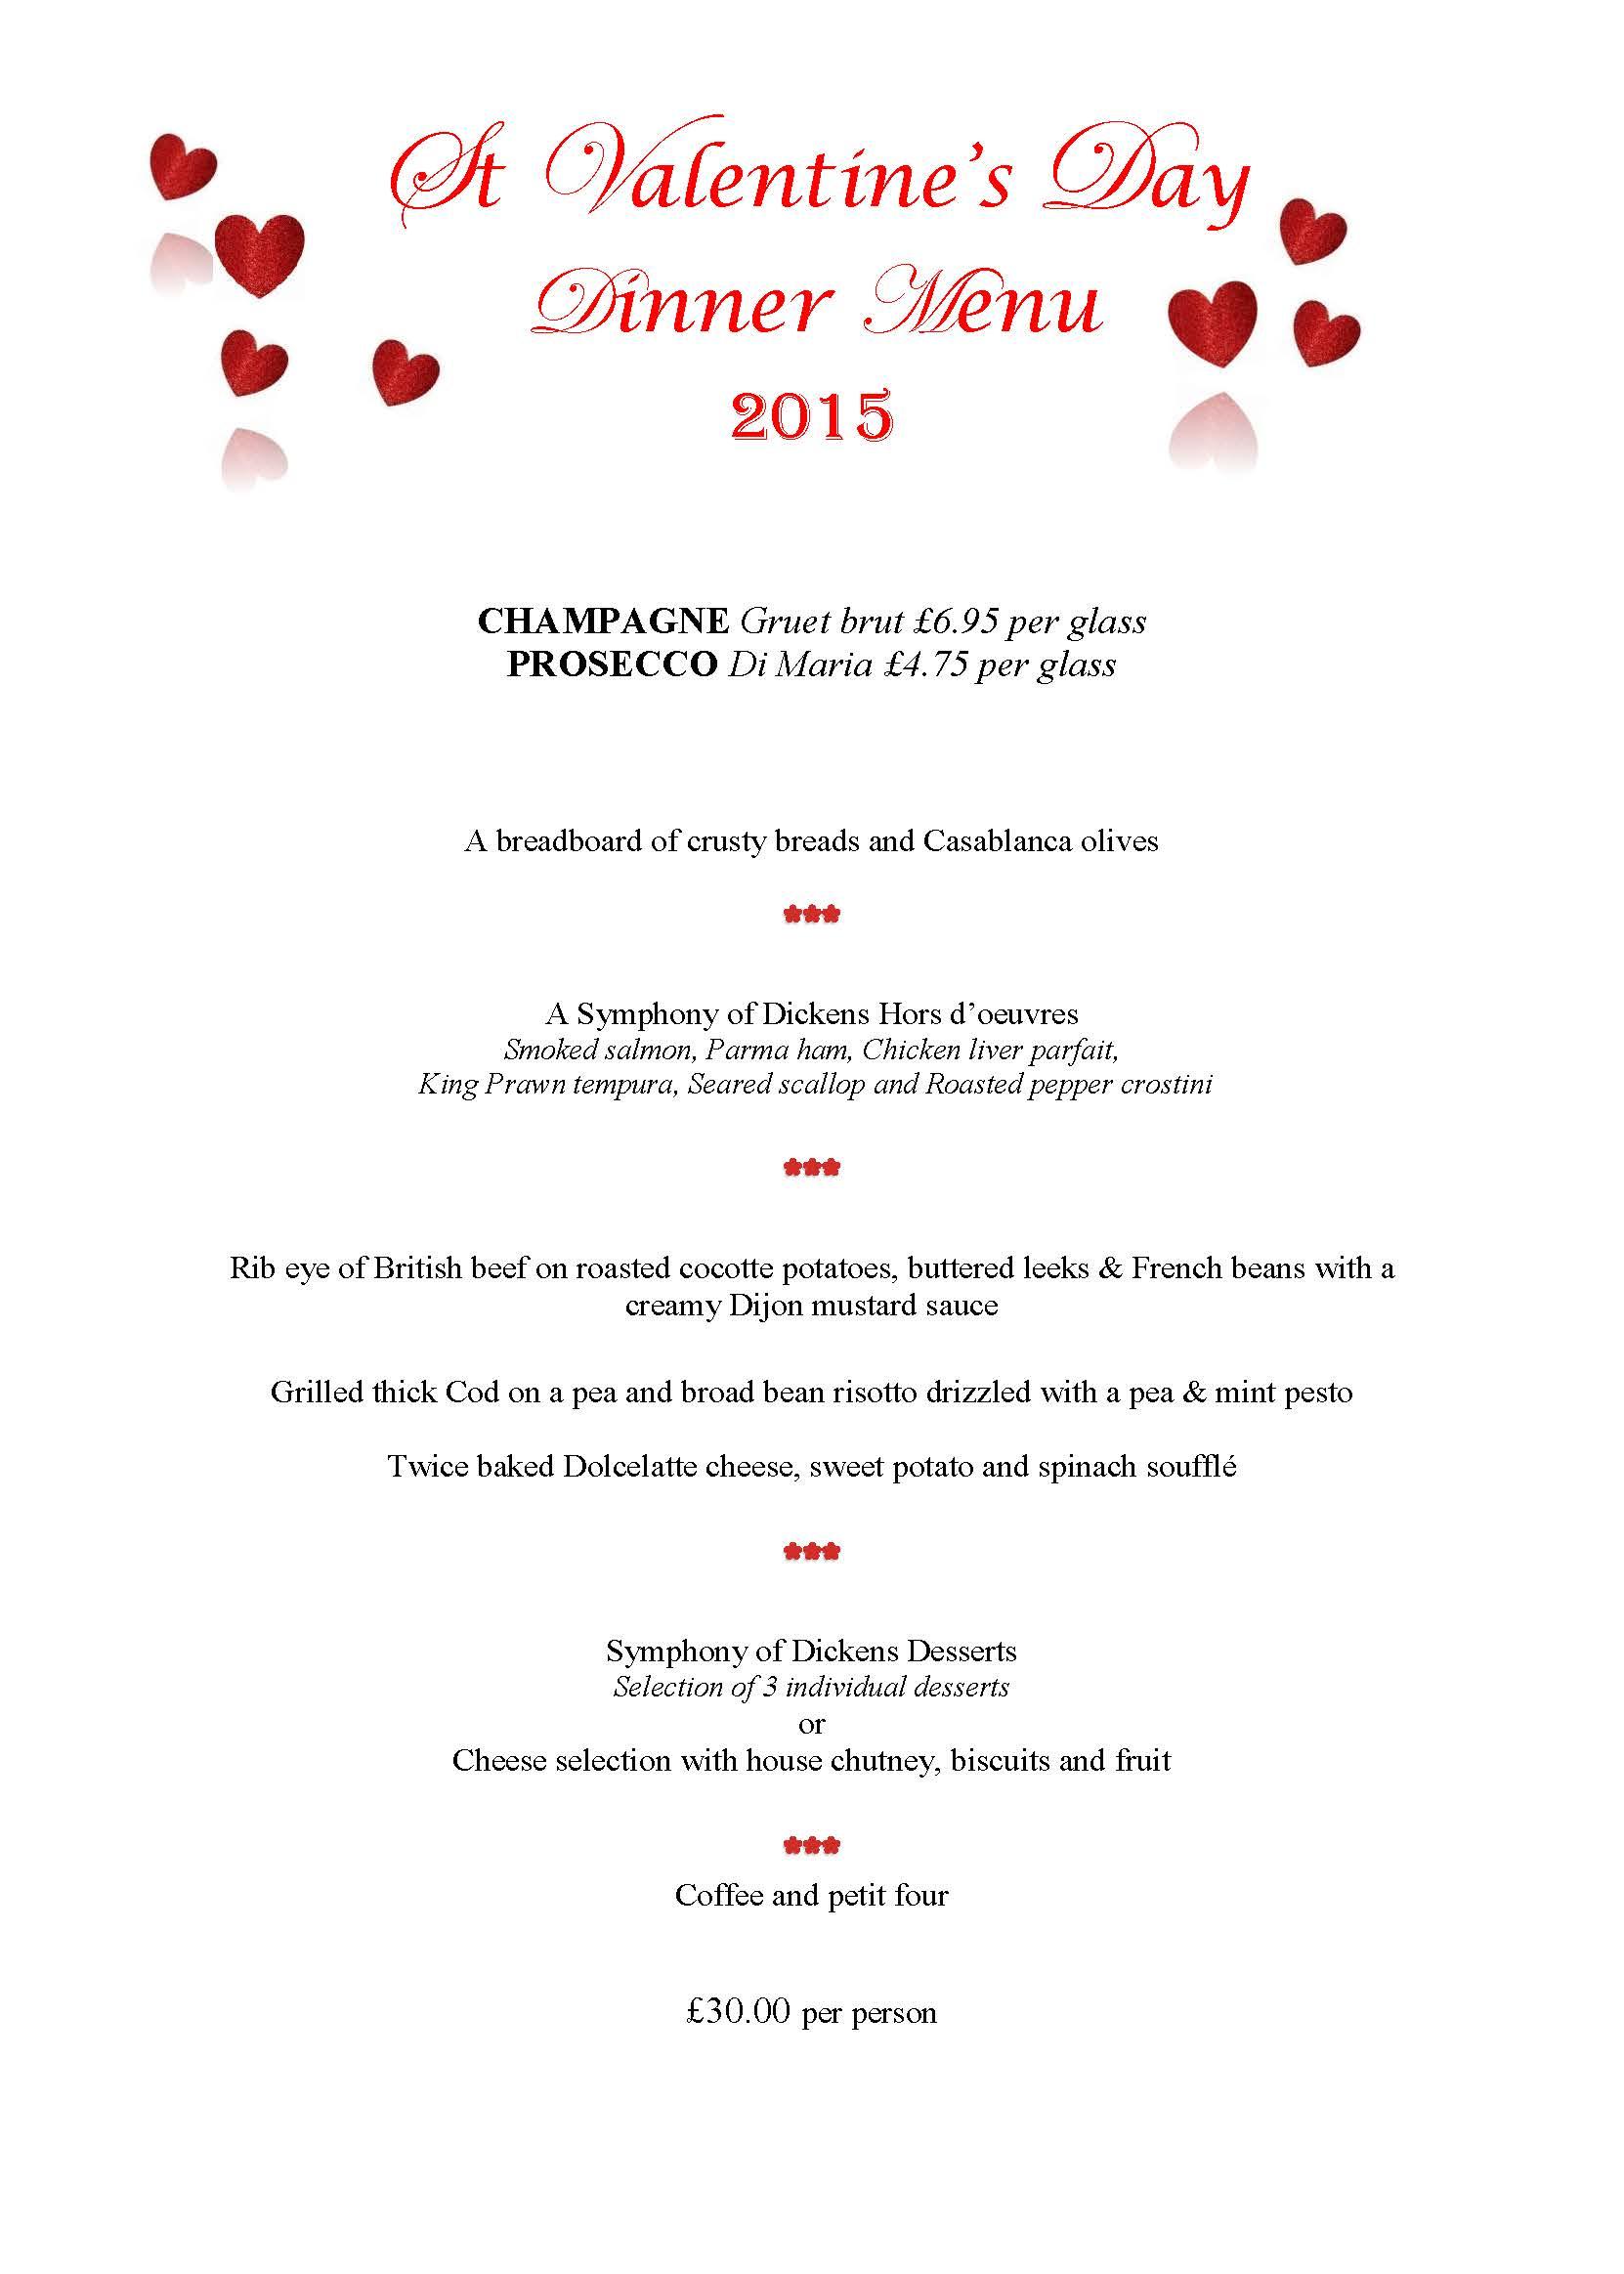 Valentines Day 2015.jpg